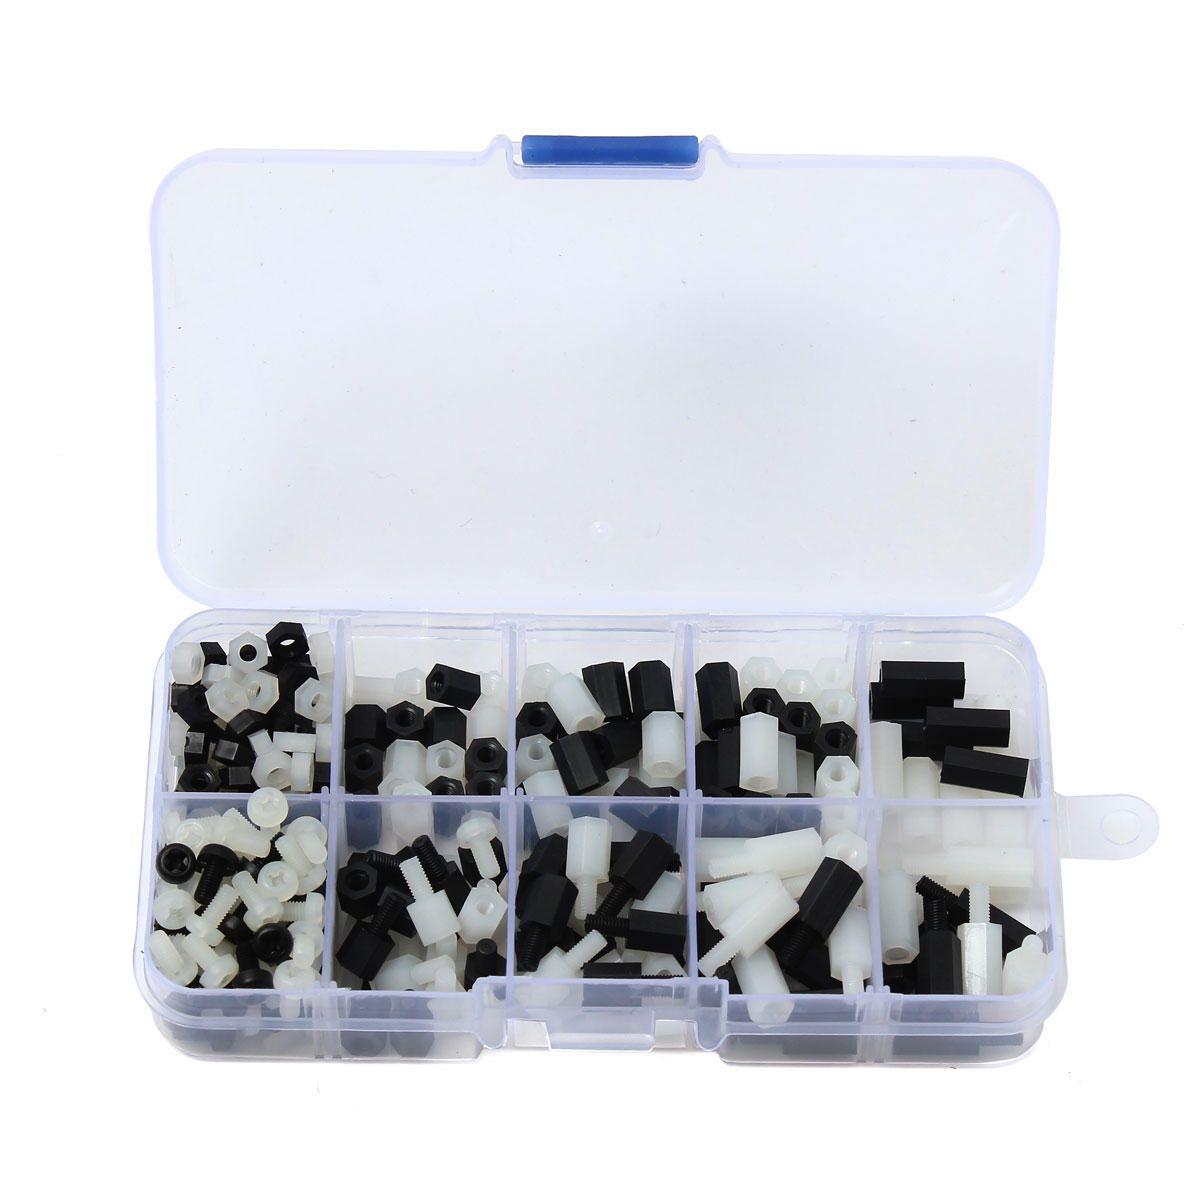 300pcs Lot M3 Nylon PCB Standoff Spacer Hex Screw Nut Assortment Kit W// Box